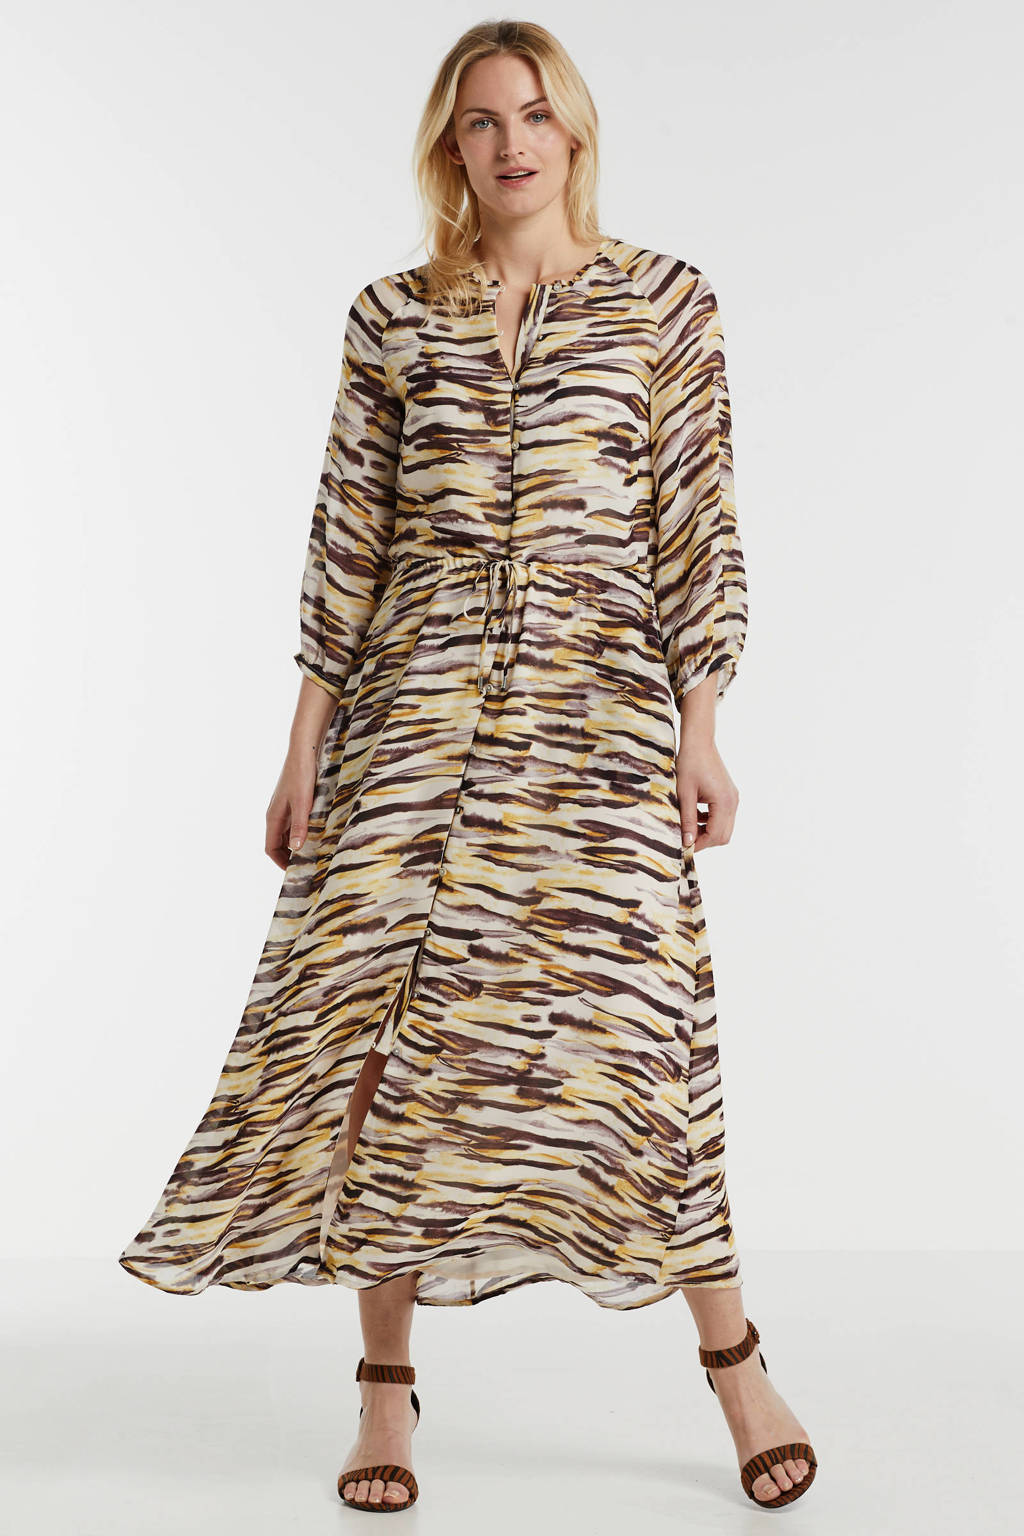 Inwear gestreepte maxi jurk DitaIW Dress beige/geel/bruin